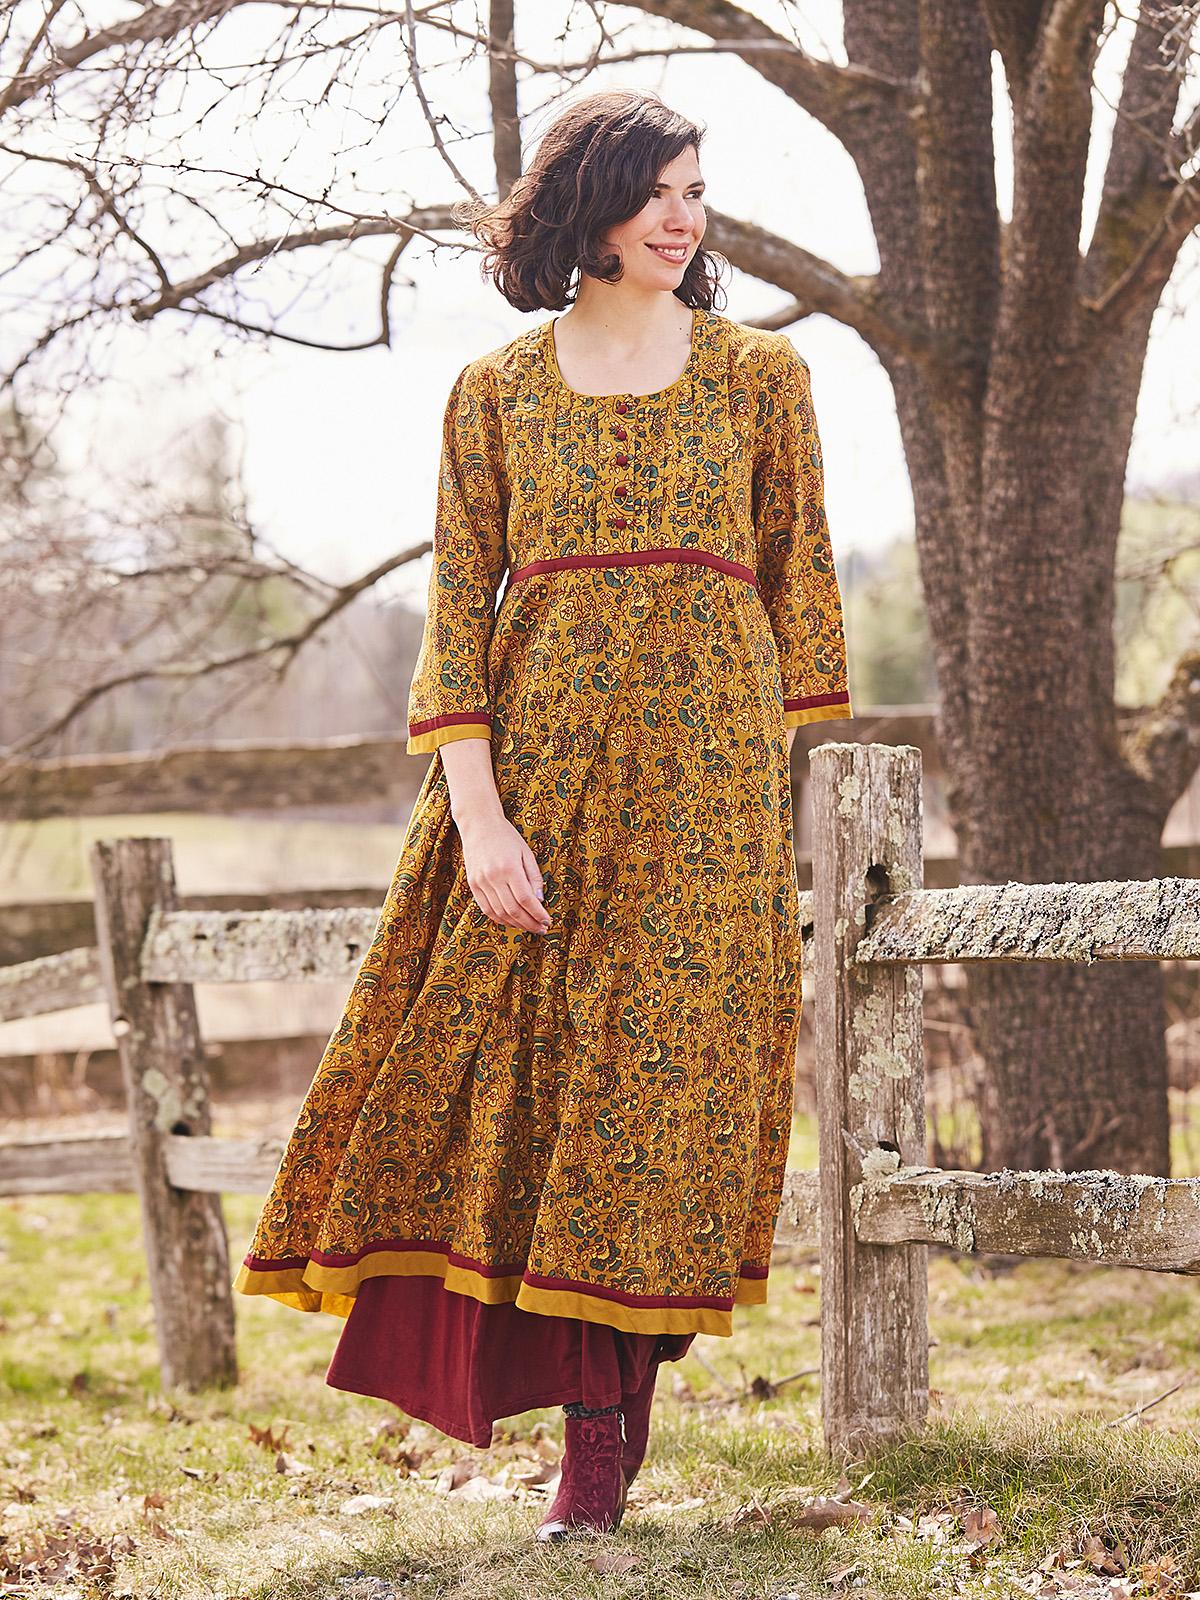 Goldflower Dress